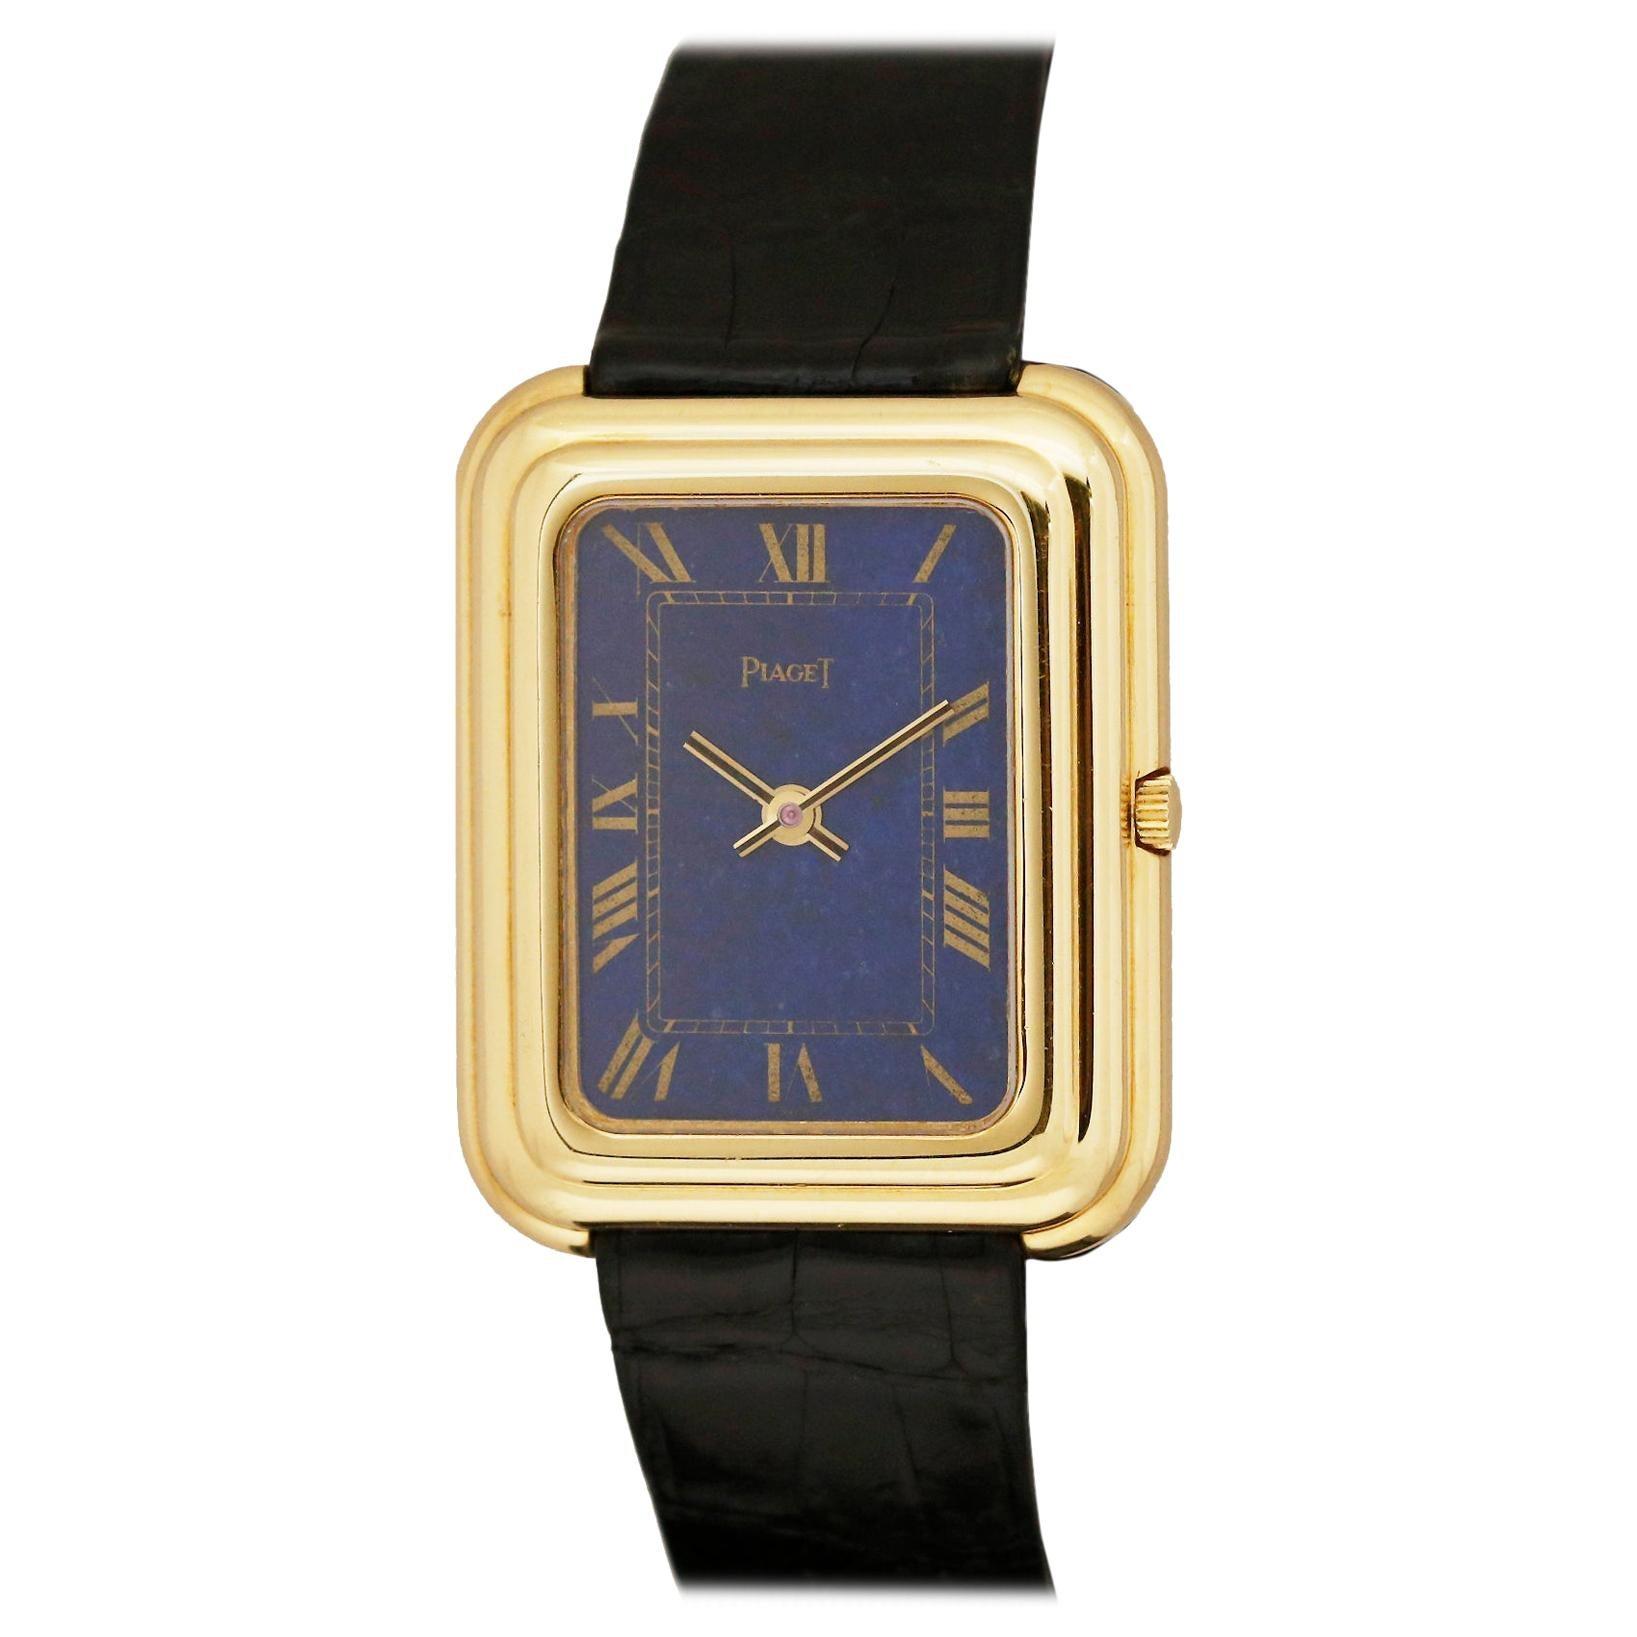 Vintage Piaget 18k Yellow Gold Beta-21 Quartz Wristwatch, Circa 1970s